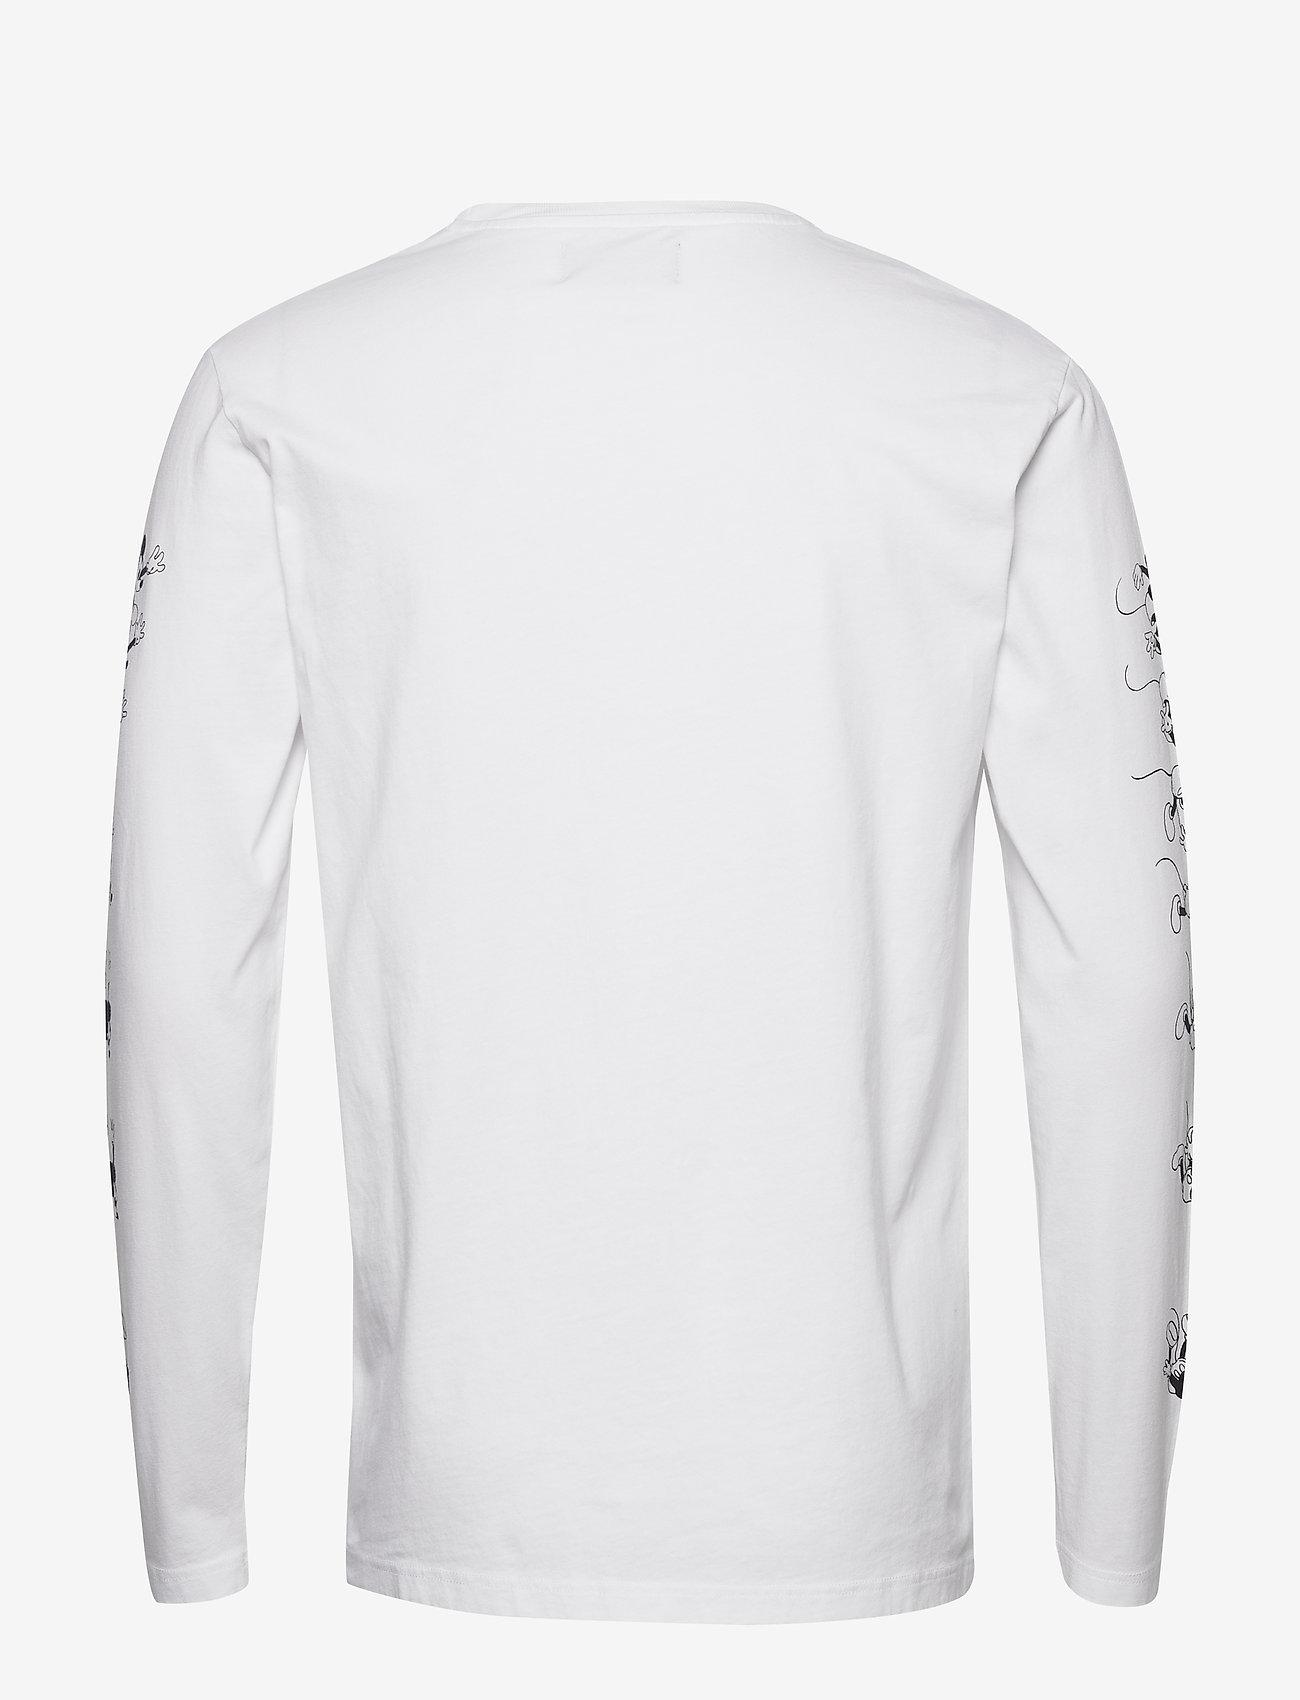 Peter Long Sleeve (Bright White) (52 €) - Wood Wood gNqJI